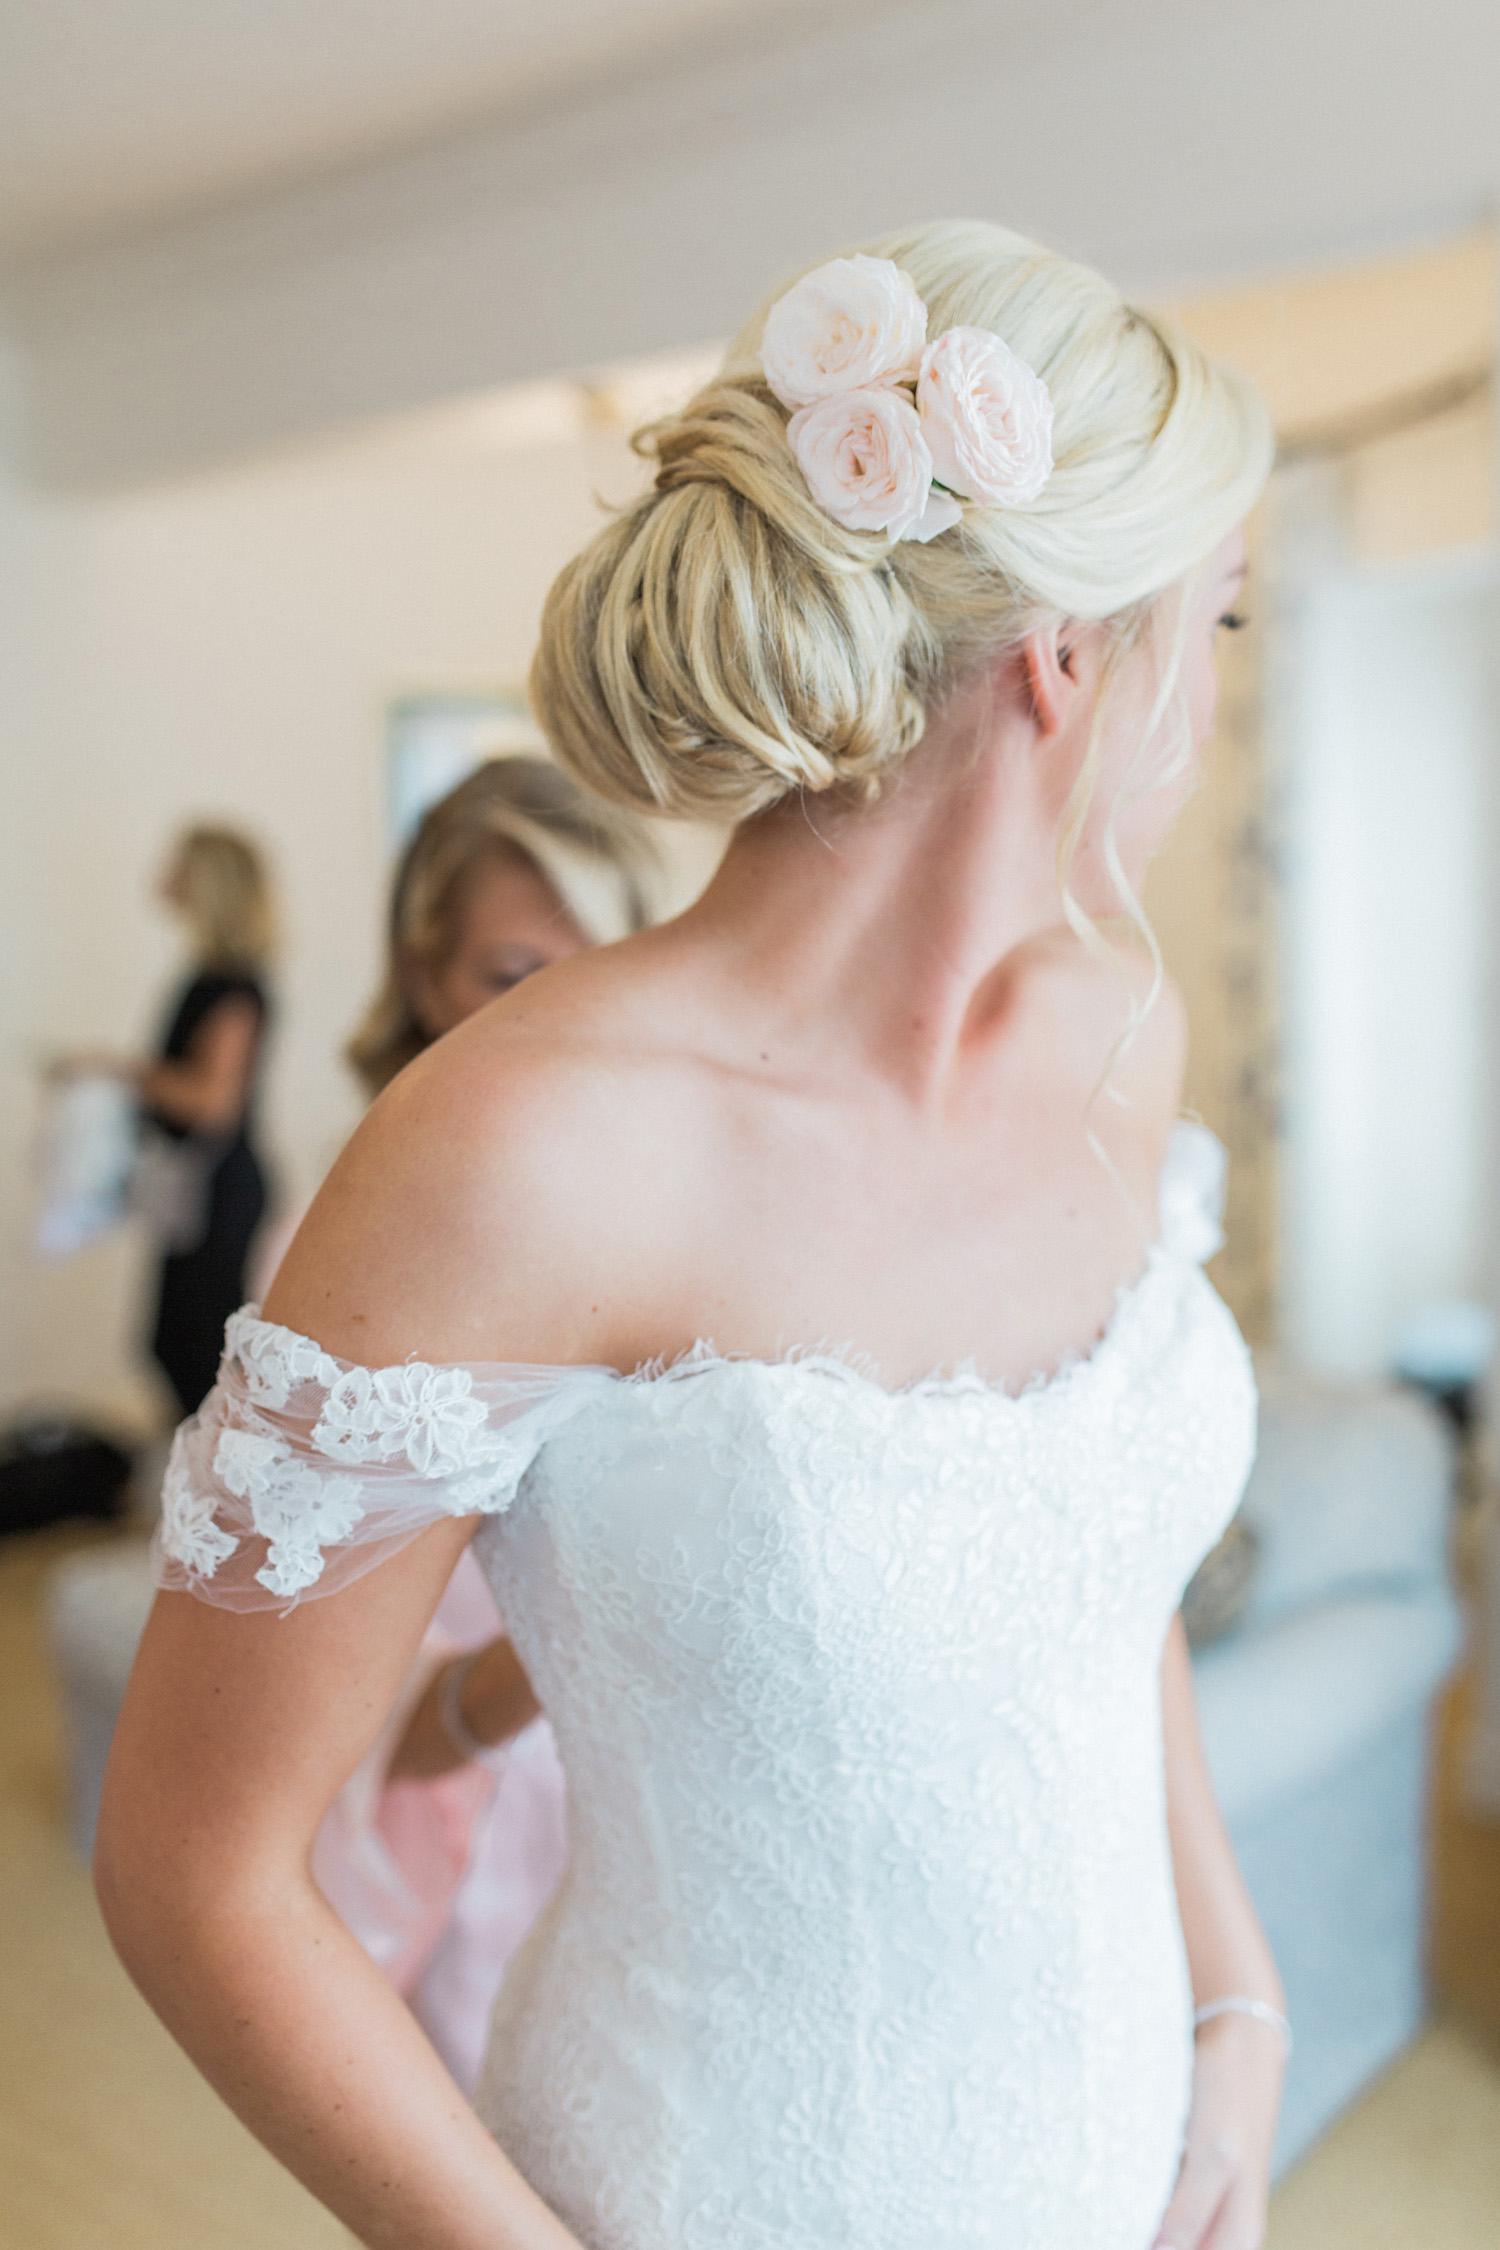 santabarbarawedding.com | Four Seasons Santa Barbara Weddings | Kiel Rucker Photography | Pretty Pink Wedding Inspiration | Lazaro Press Stationery and Design